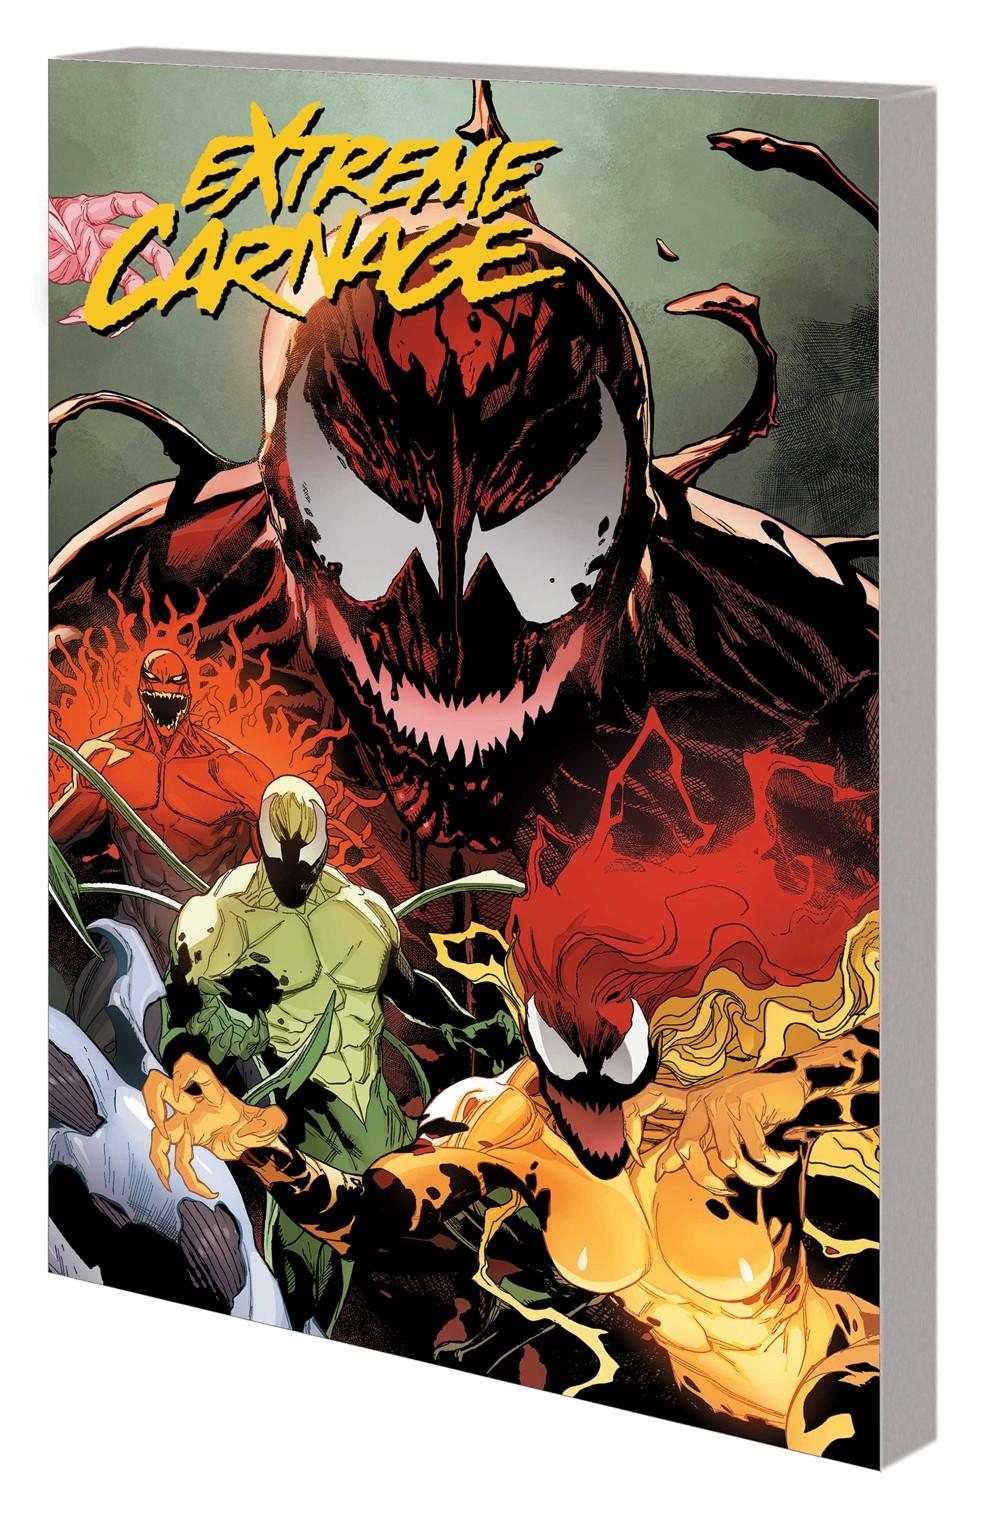 EXTREME_CARNAGE_TPB Marvel Comics September 2021 Solicitations